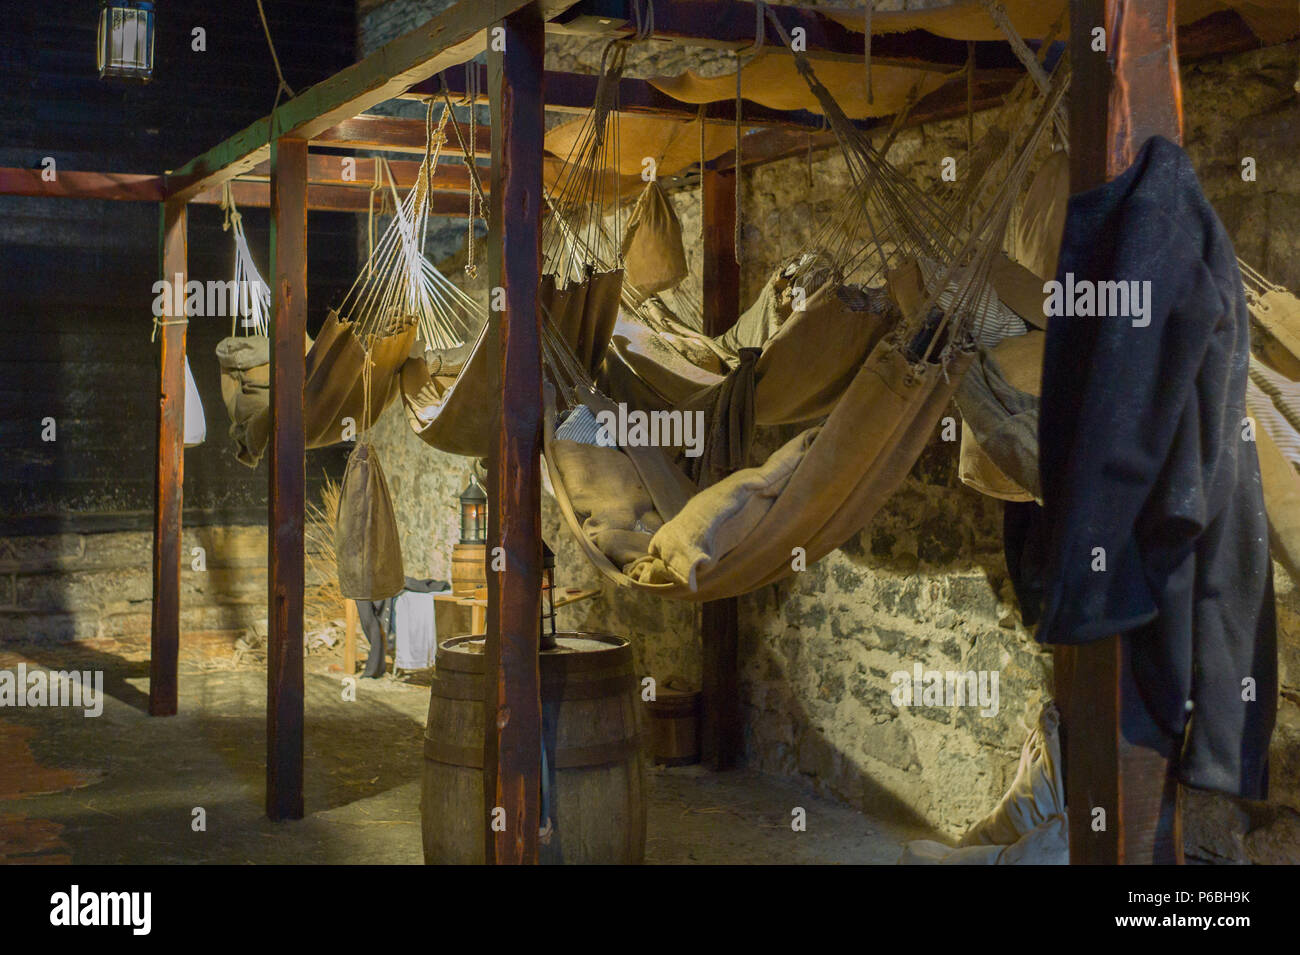 Hammocks hanging in the prison inside Edinburgh Castle used by prisoners of war. Scotland - Stock Image